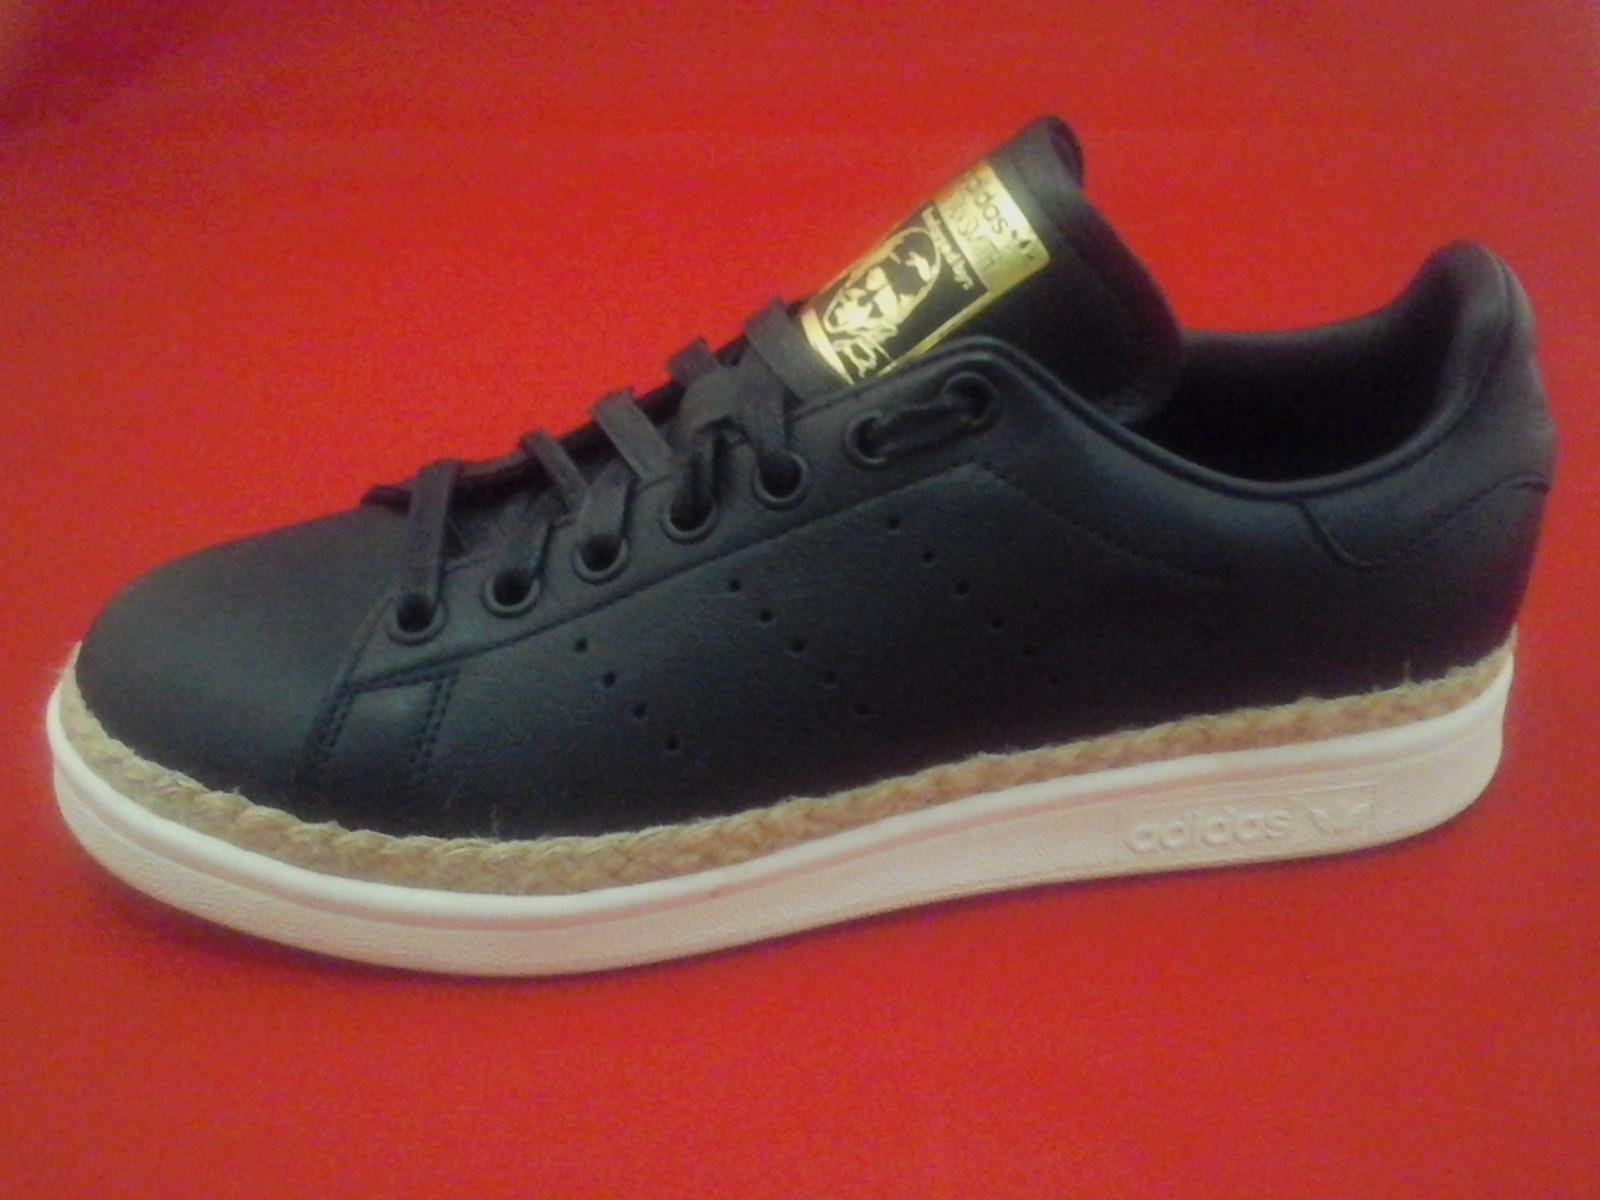 9a5cff10722 ADIDAS Stan Smith Shoes New Bold W Espadrilles Black Sneakers DA9536 Women s